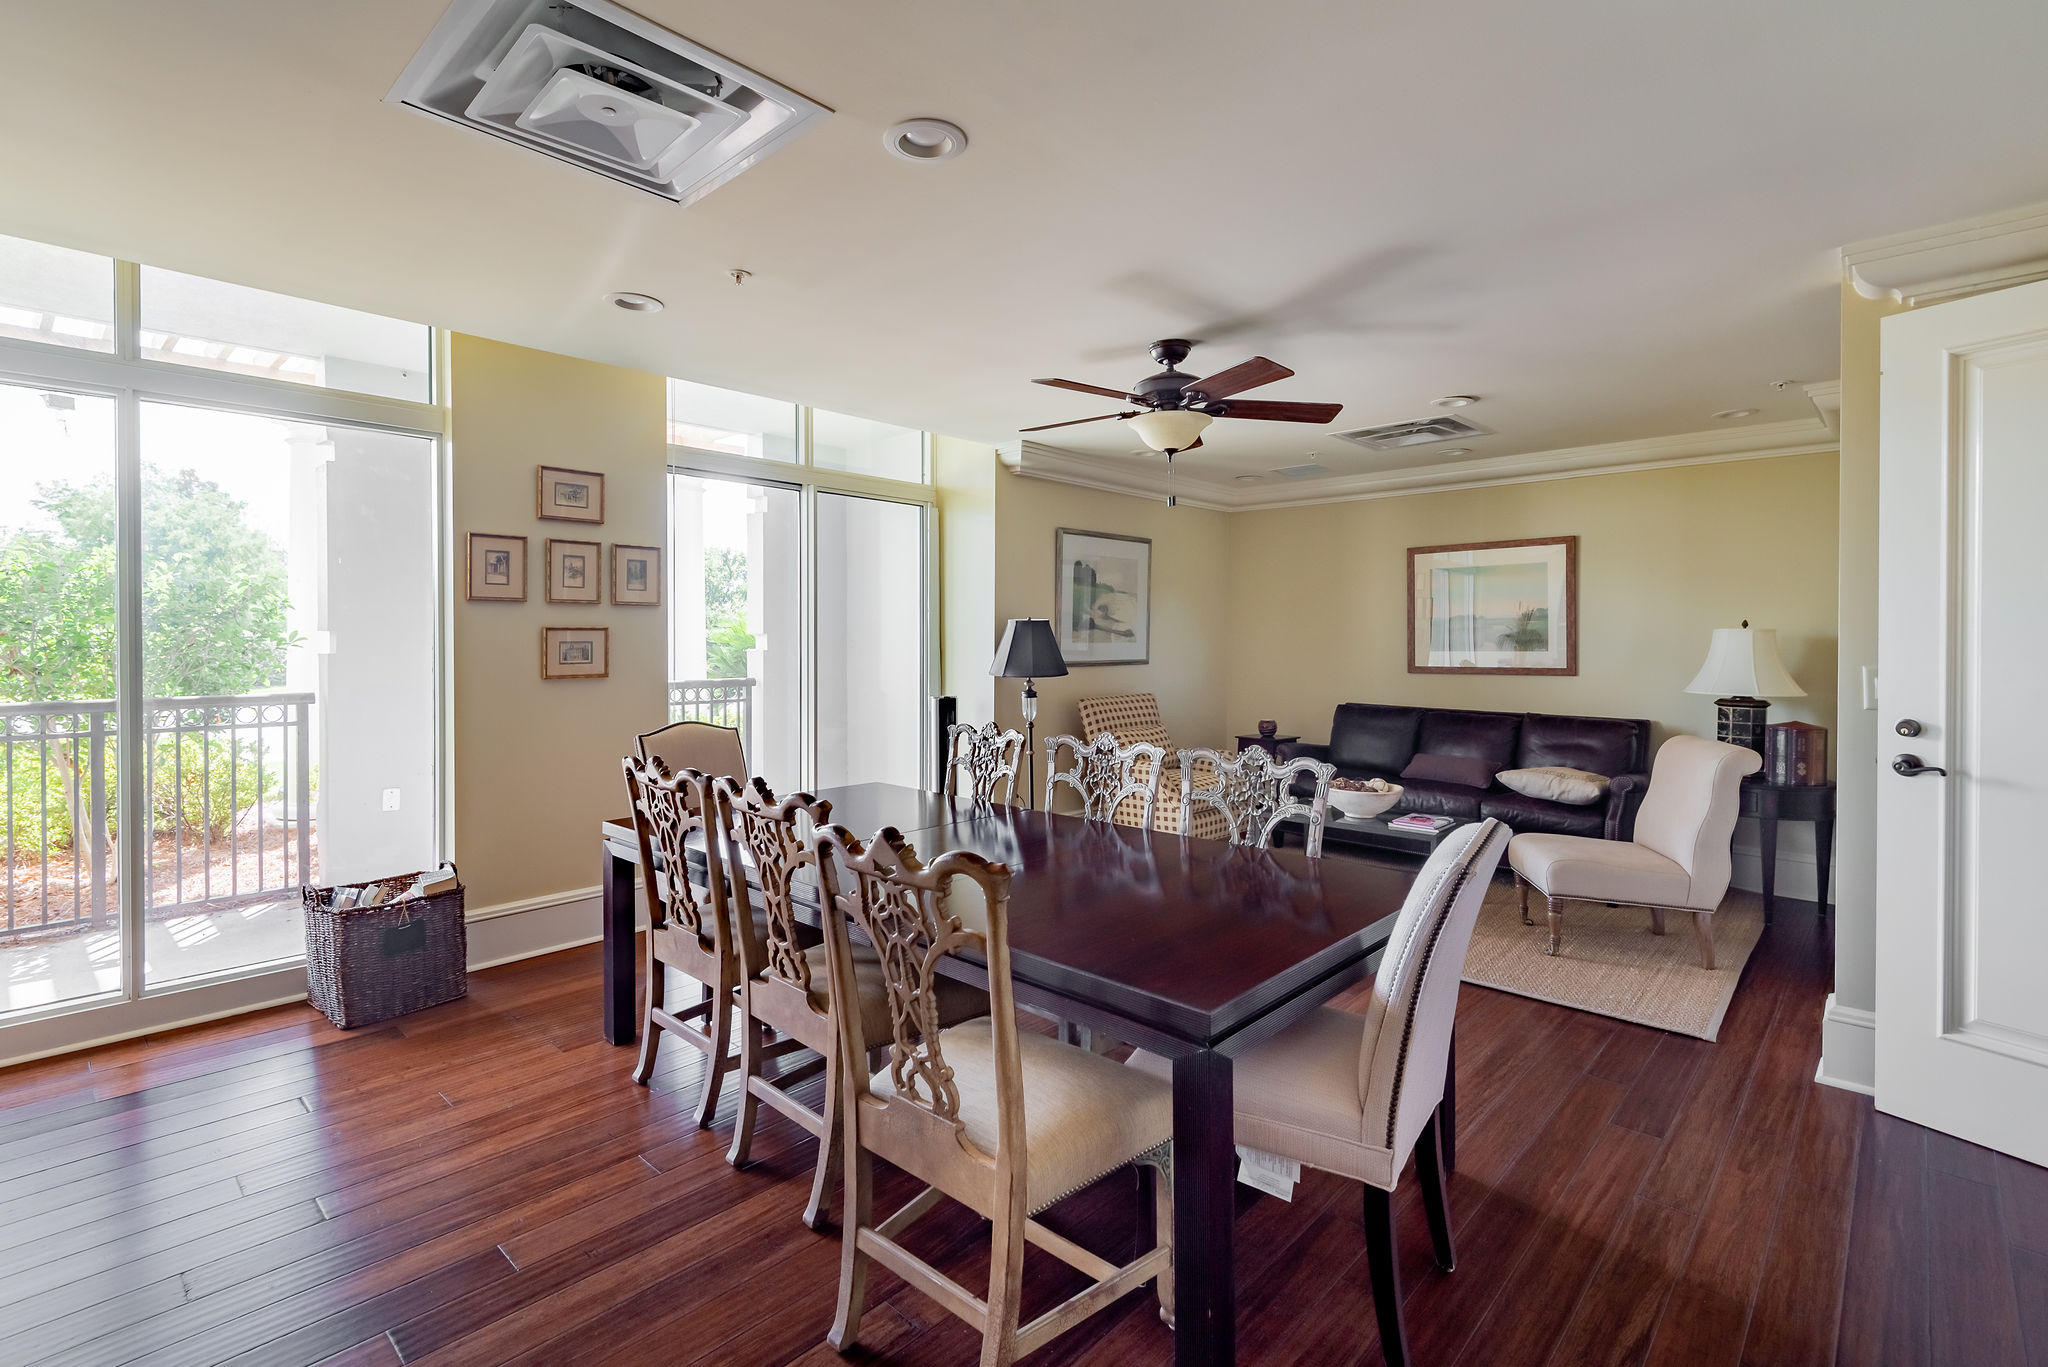 Renaissance On Chas Harbor Homes For Sale - 211 Plaza, Mount Pleasant, SC - 24